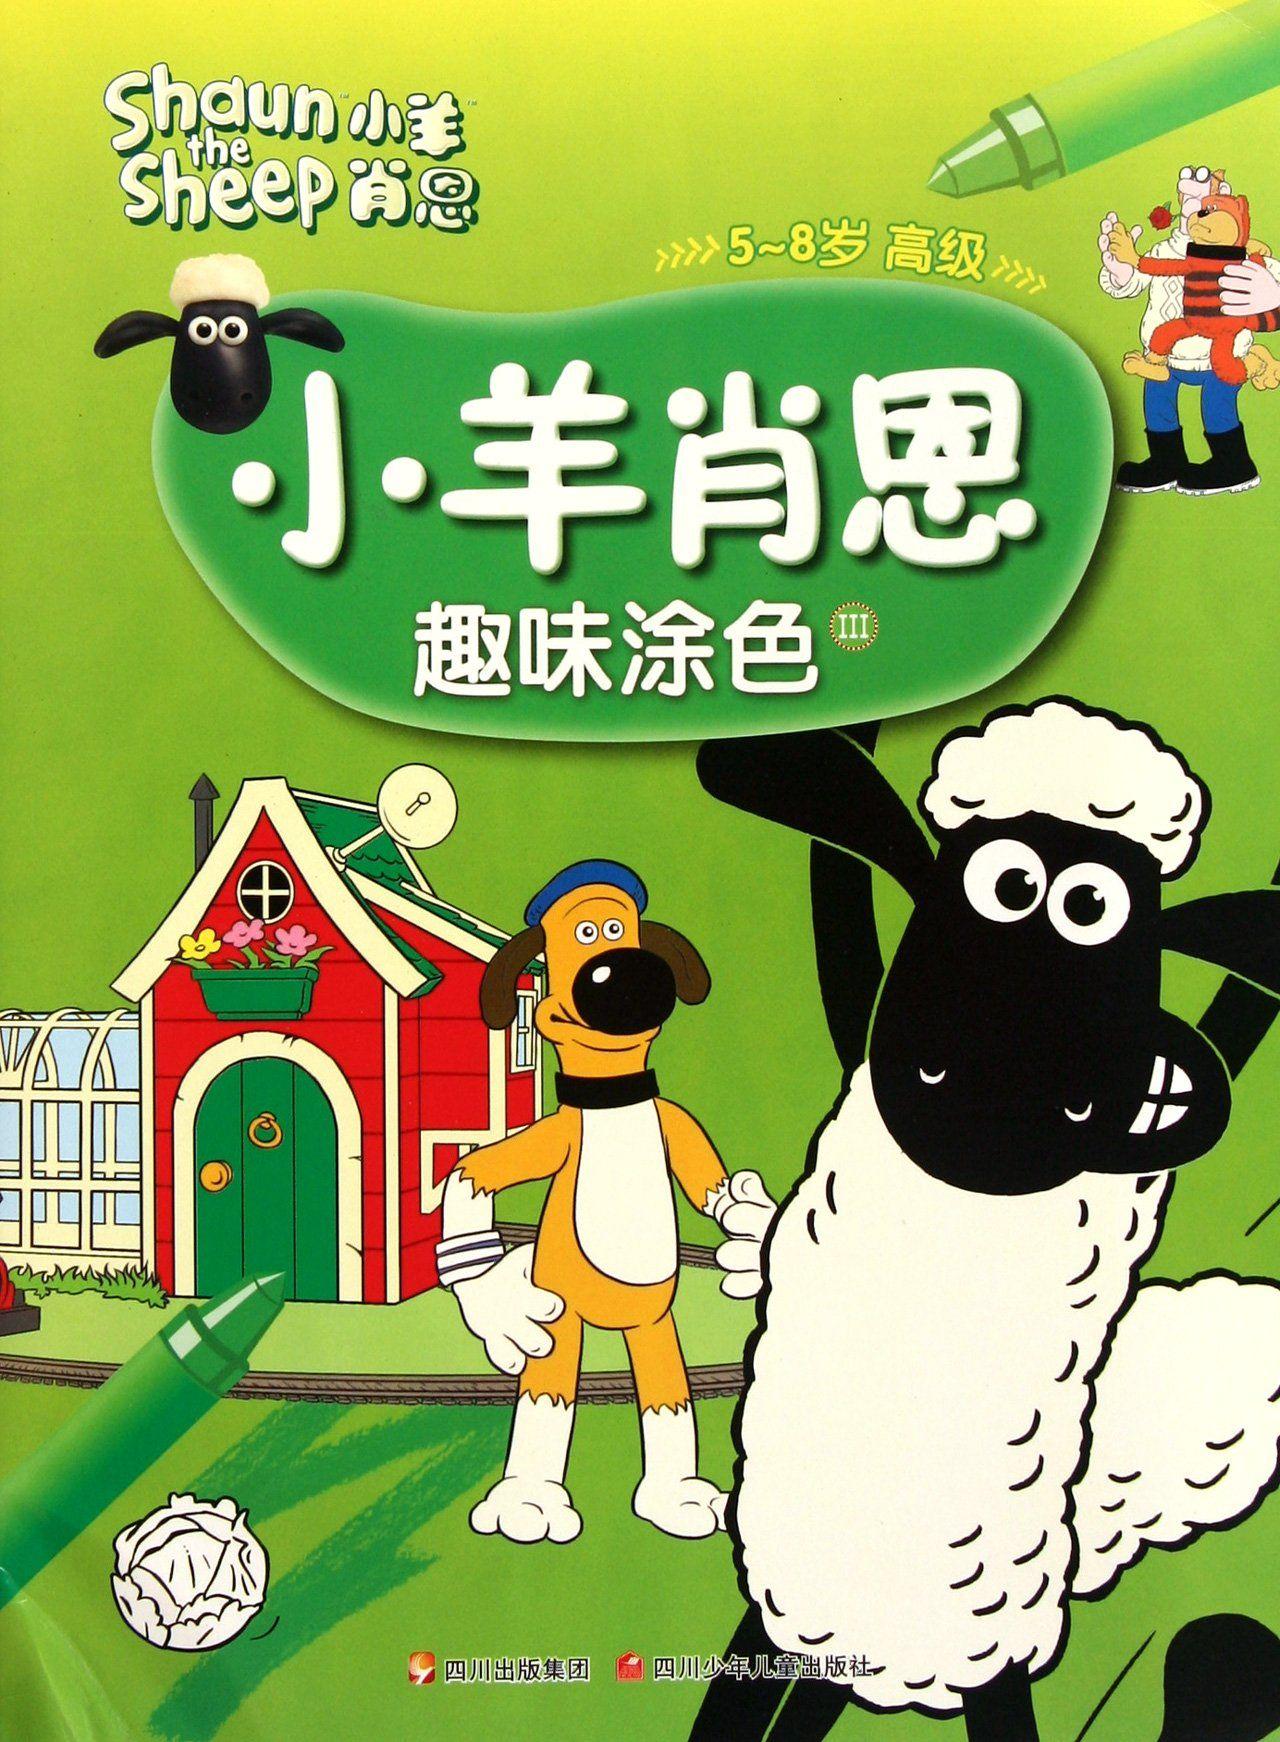 Shaun the Sheep Coloring Book Series Interesting Coloring III ...